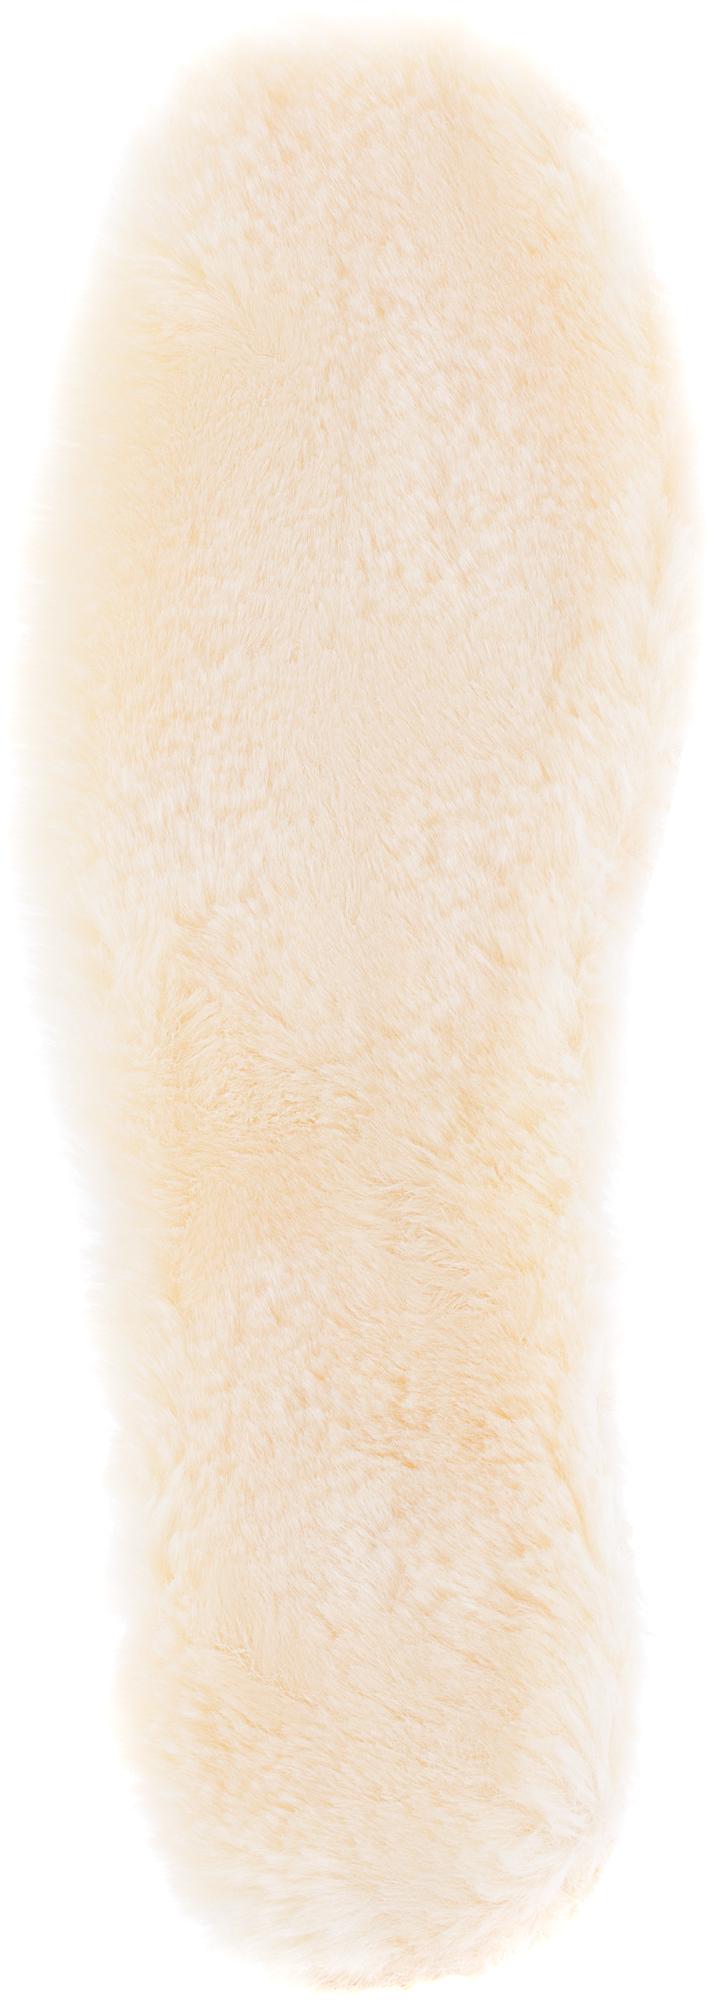 Solers Стельки Solers Heat Fur, размер 42-43